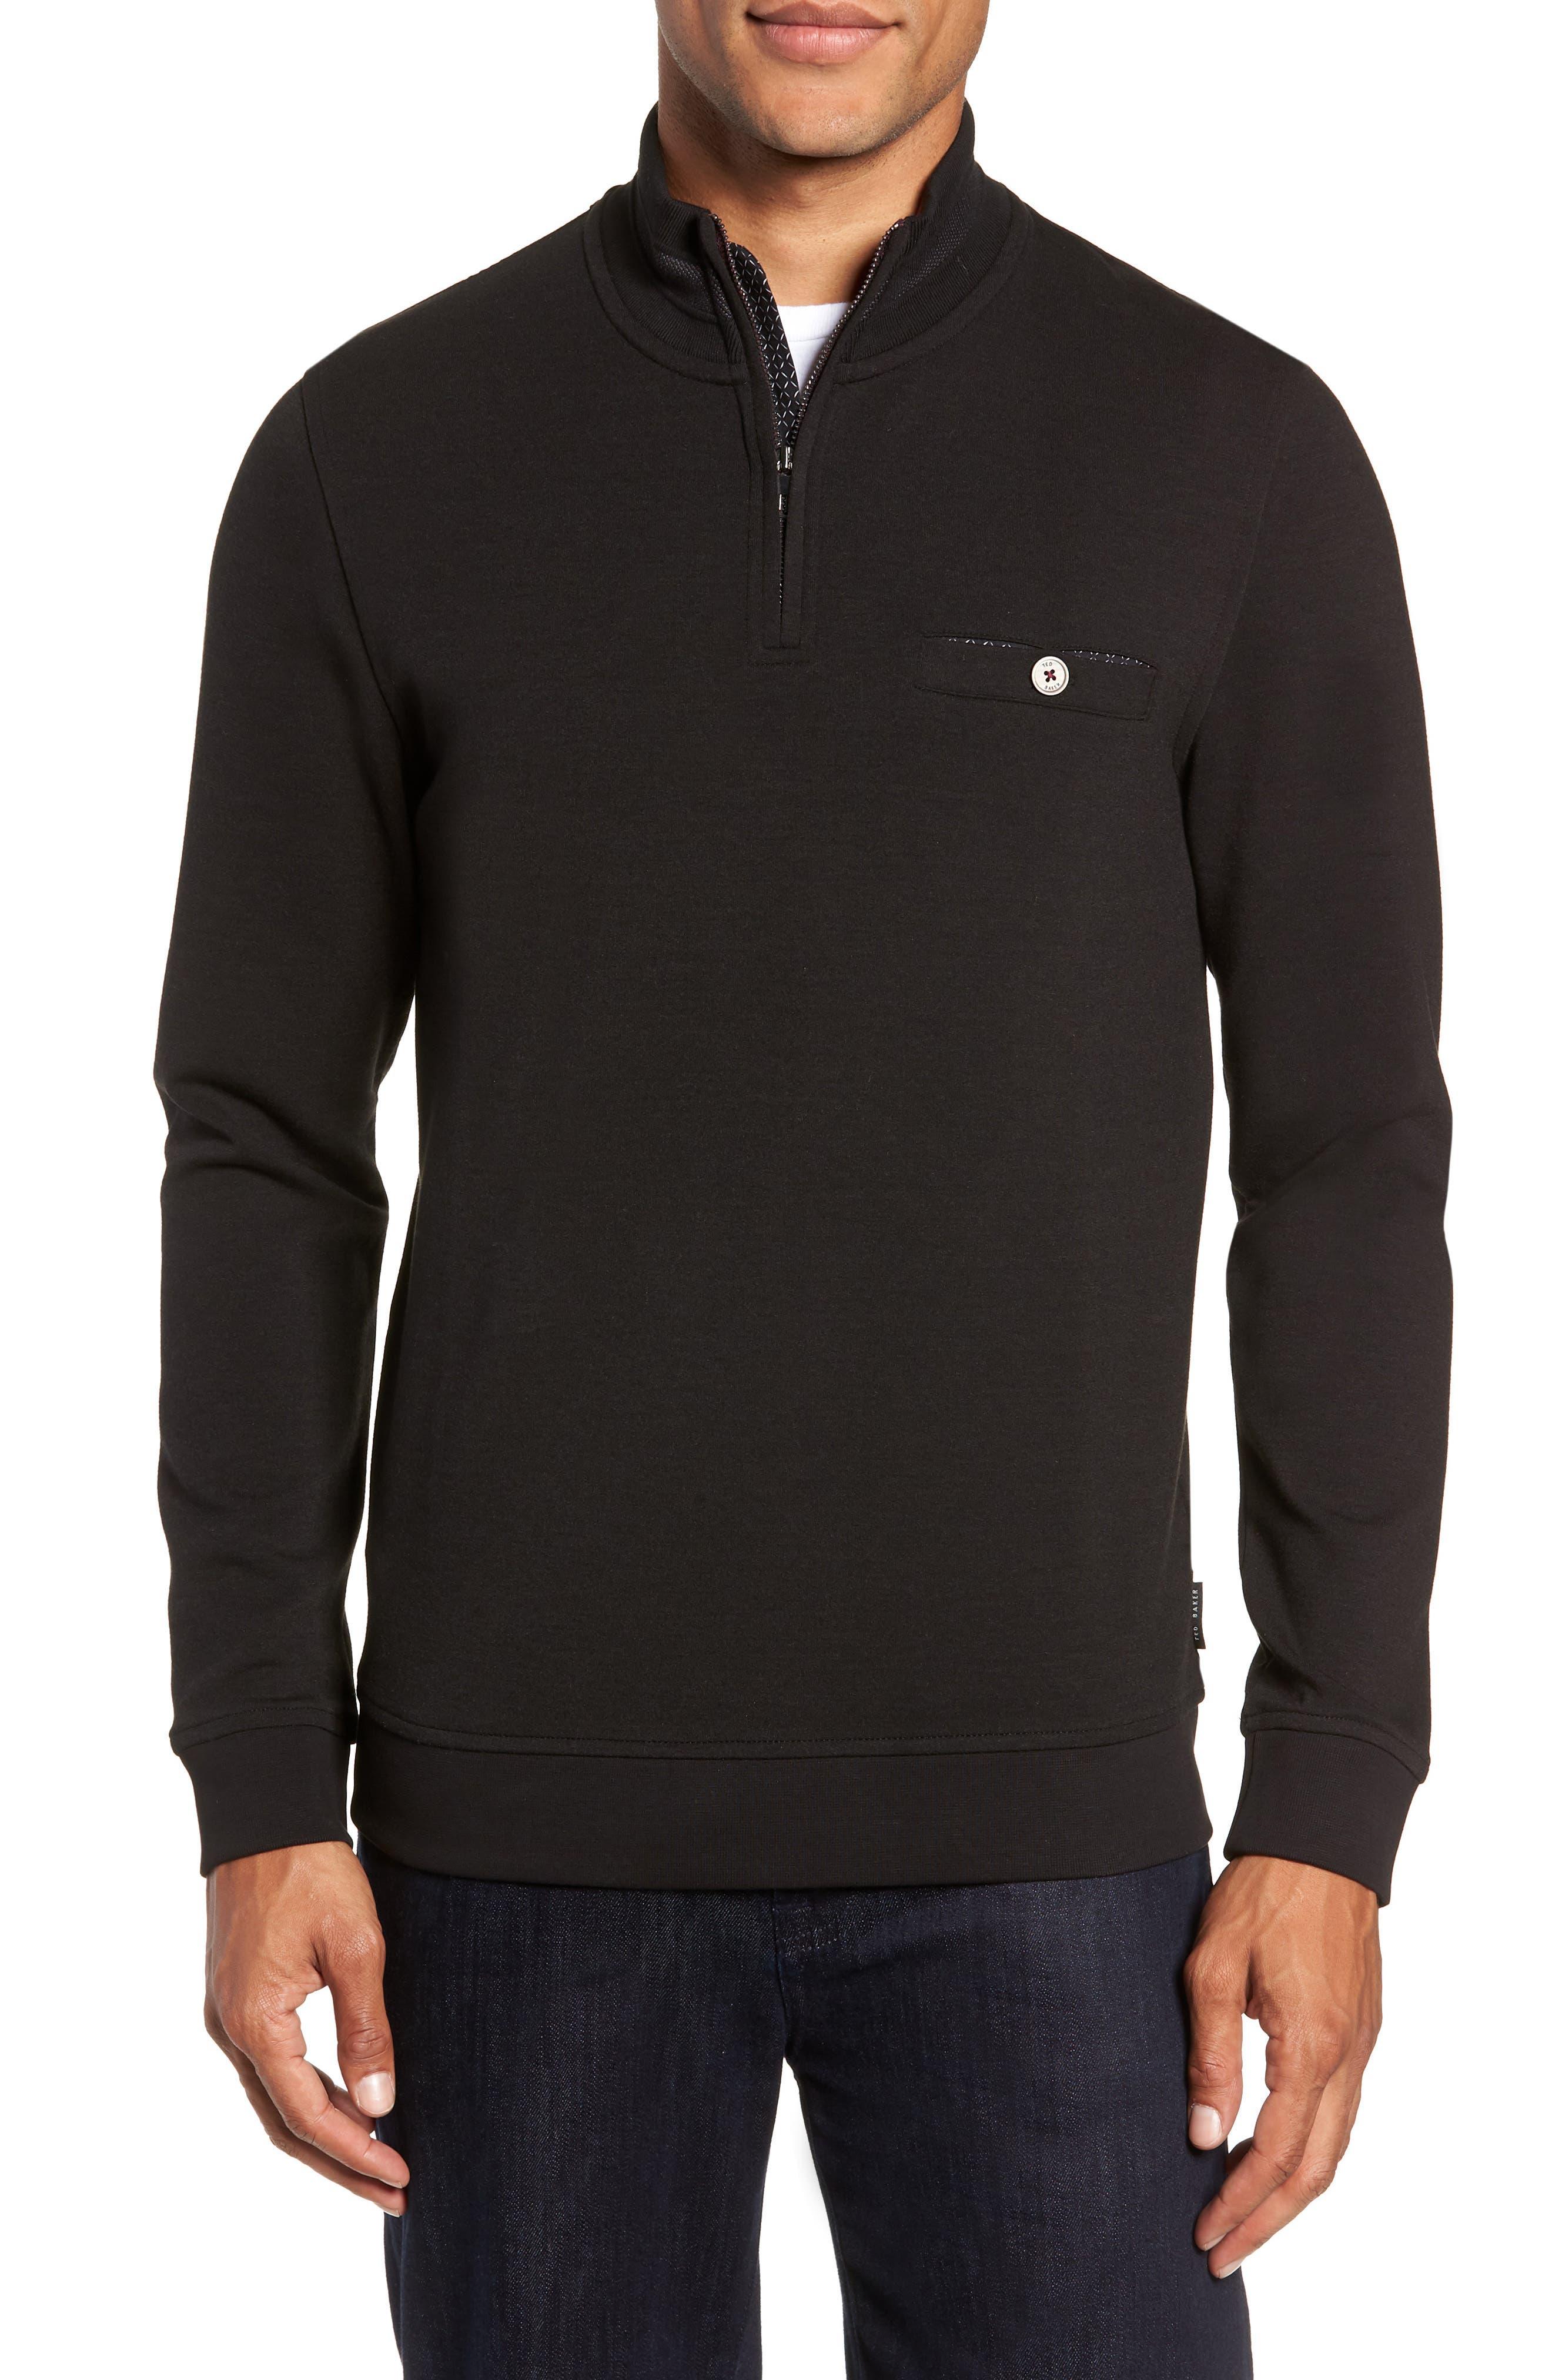 Peper Trim Fit Half Zip Pullover,                         Main,                         color, 001